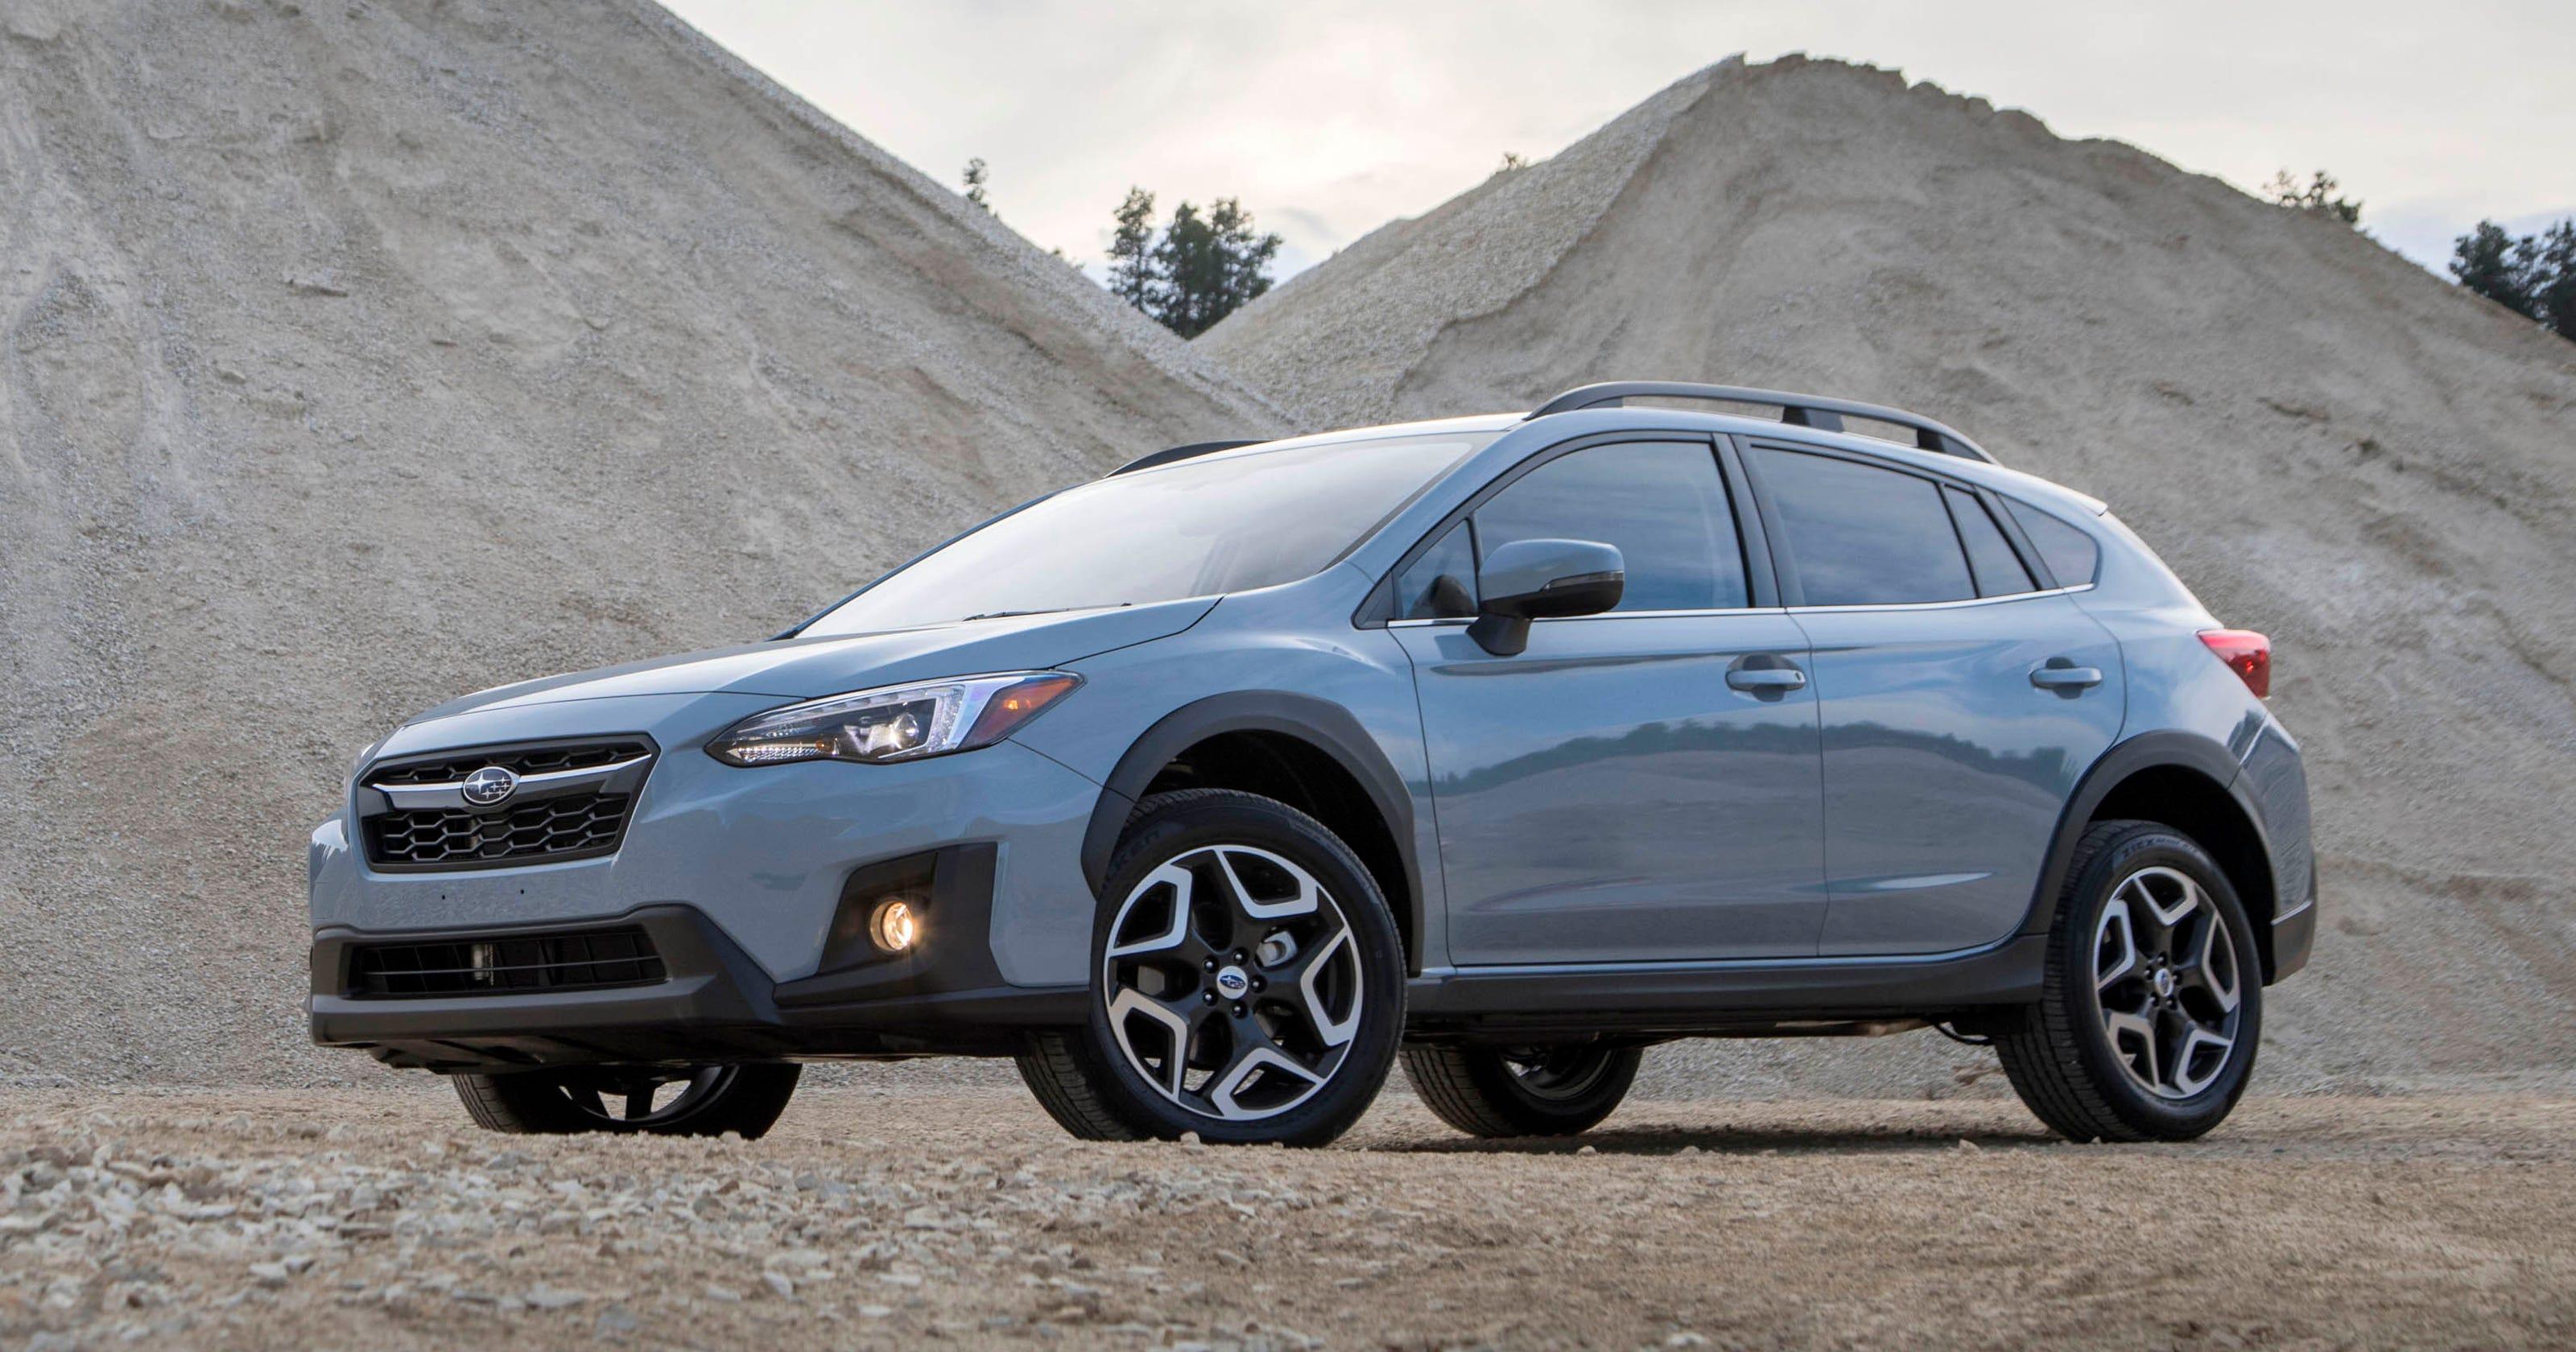 Subaru recalls nearly 400K vehicles to fix stalling problems